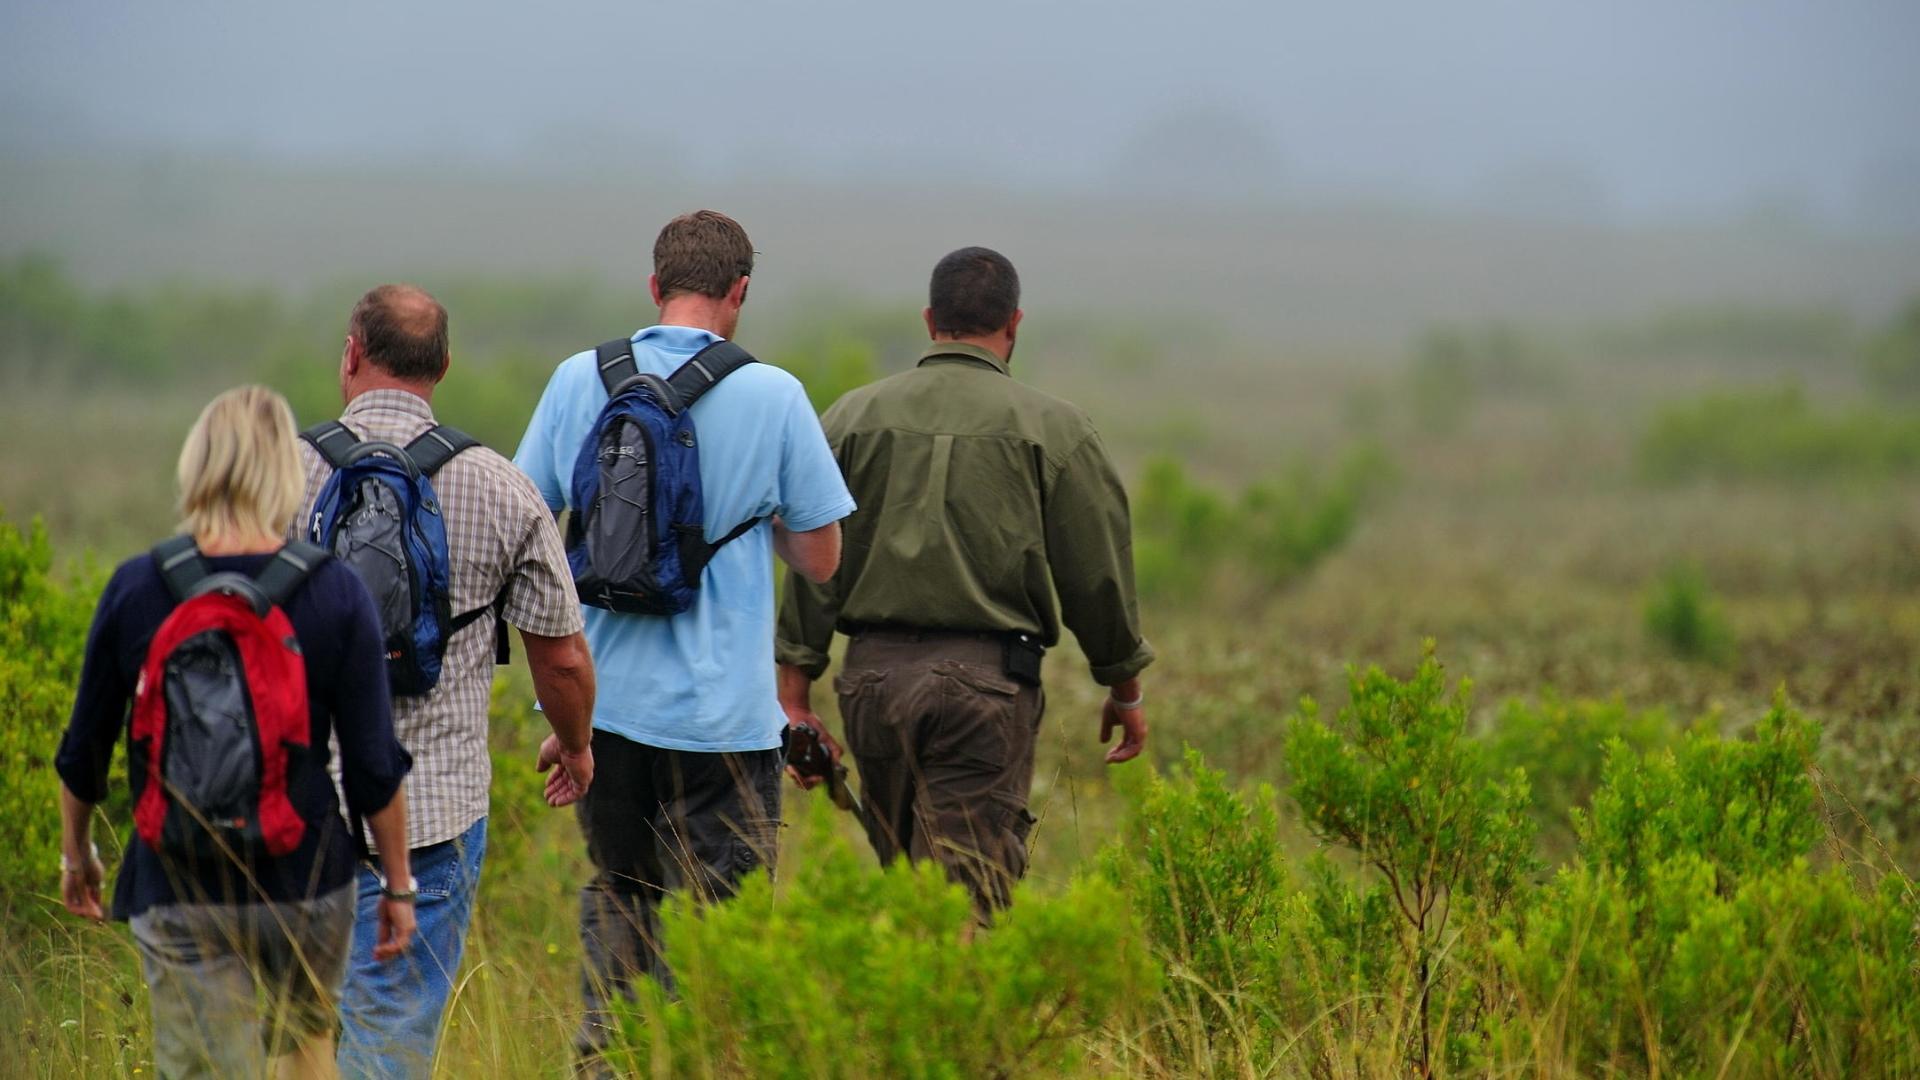 shamwari-walking-safari-1.jpg